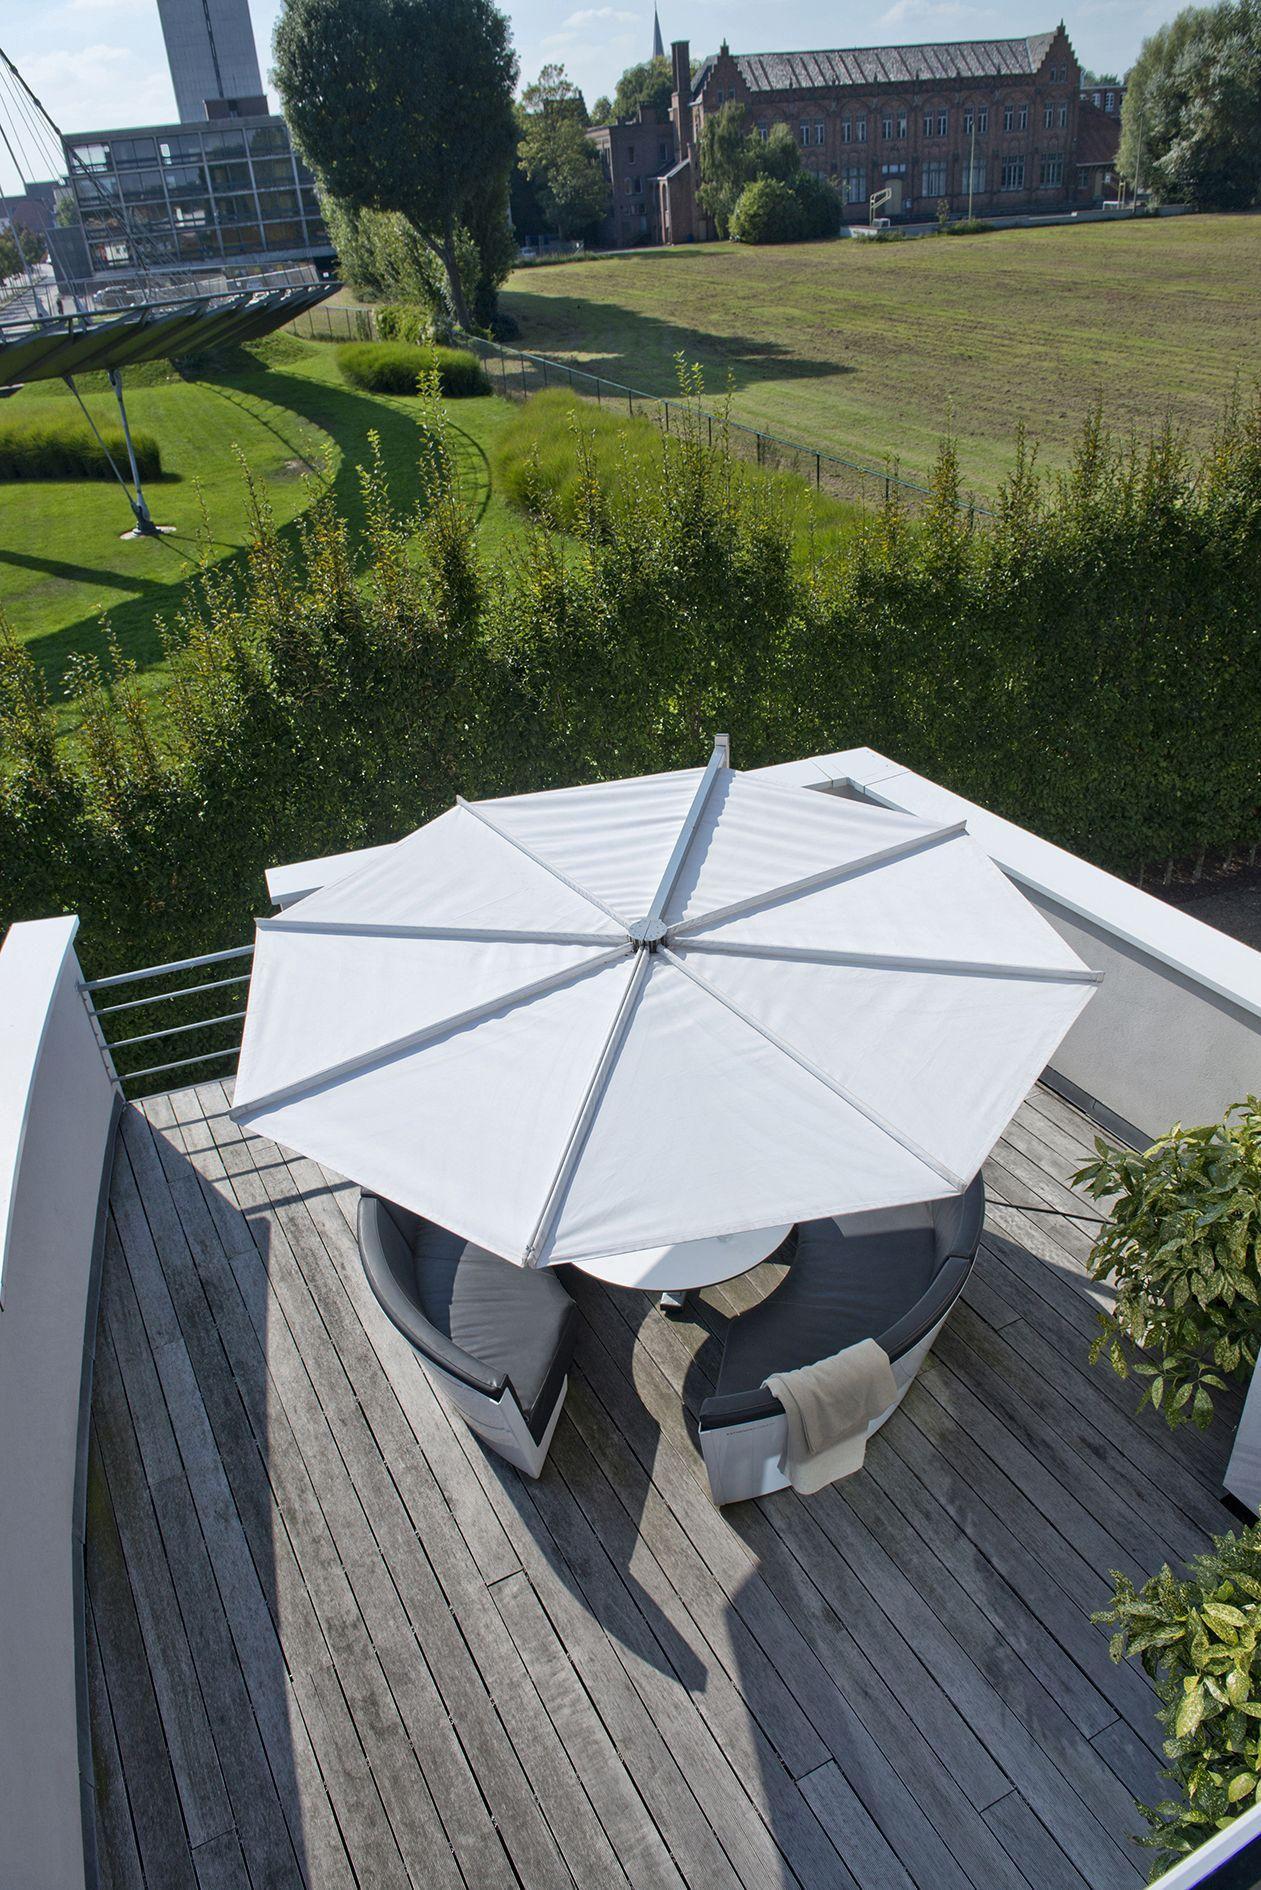 The Kosmos Round Parasol Has An Ingenious Design And Opens